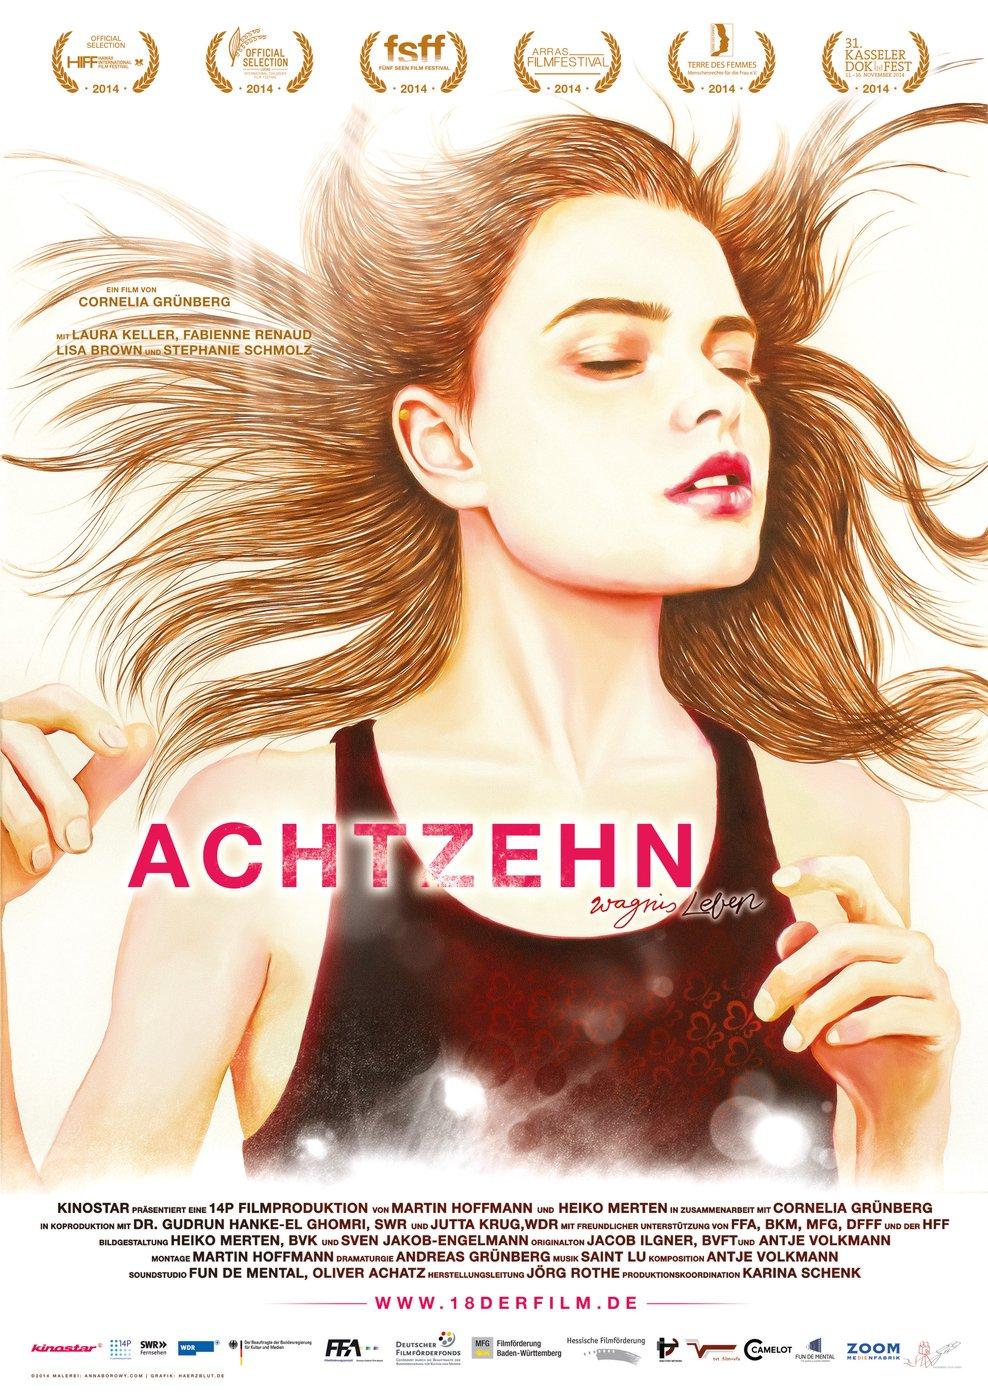 Achtzehn (Poster)